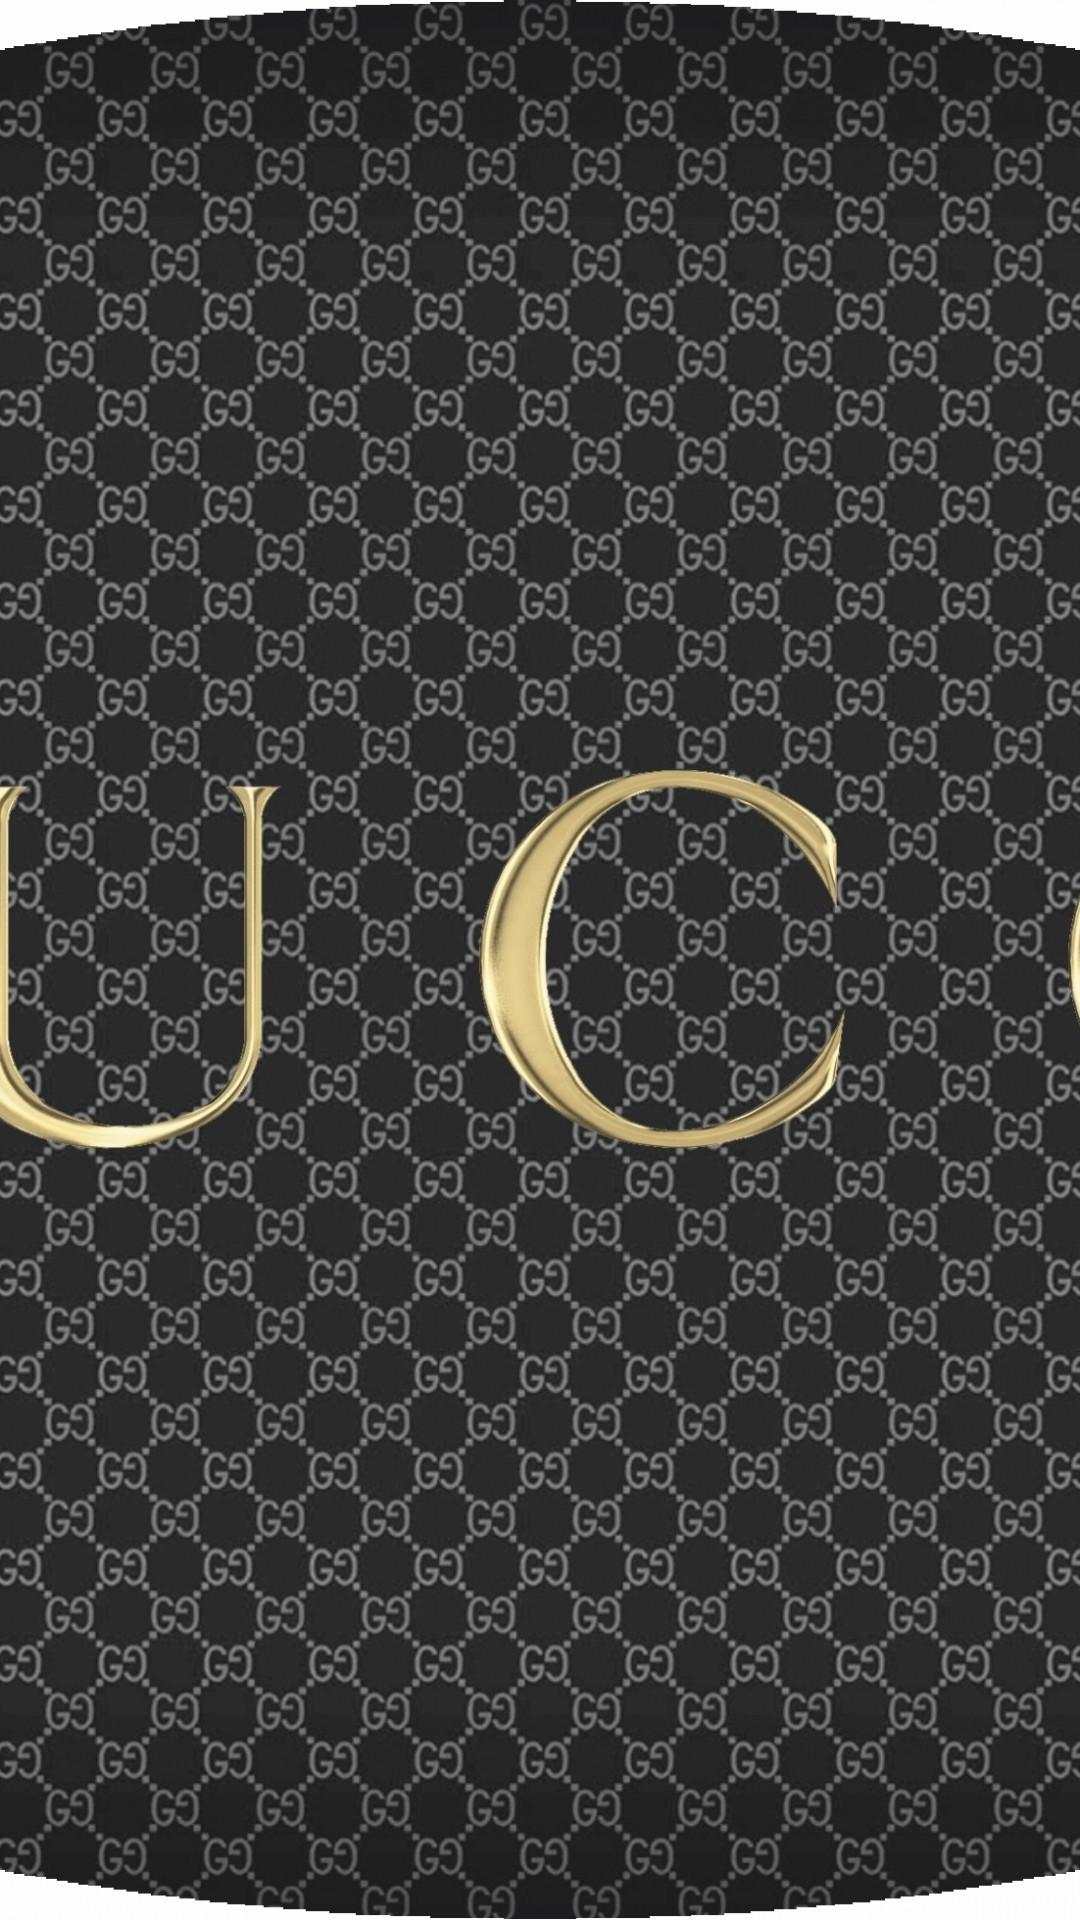 Imgur Iphone Wallpaper Gucci Wallpaper 69 Immagini